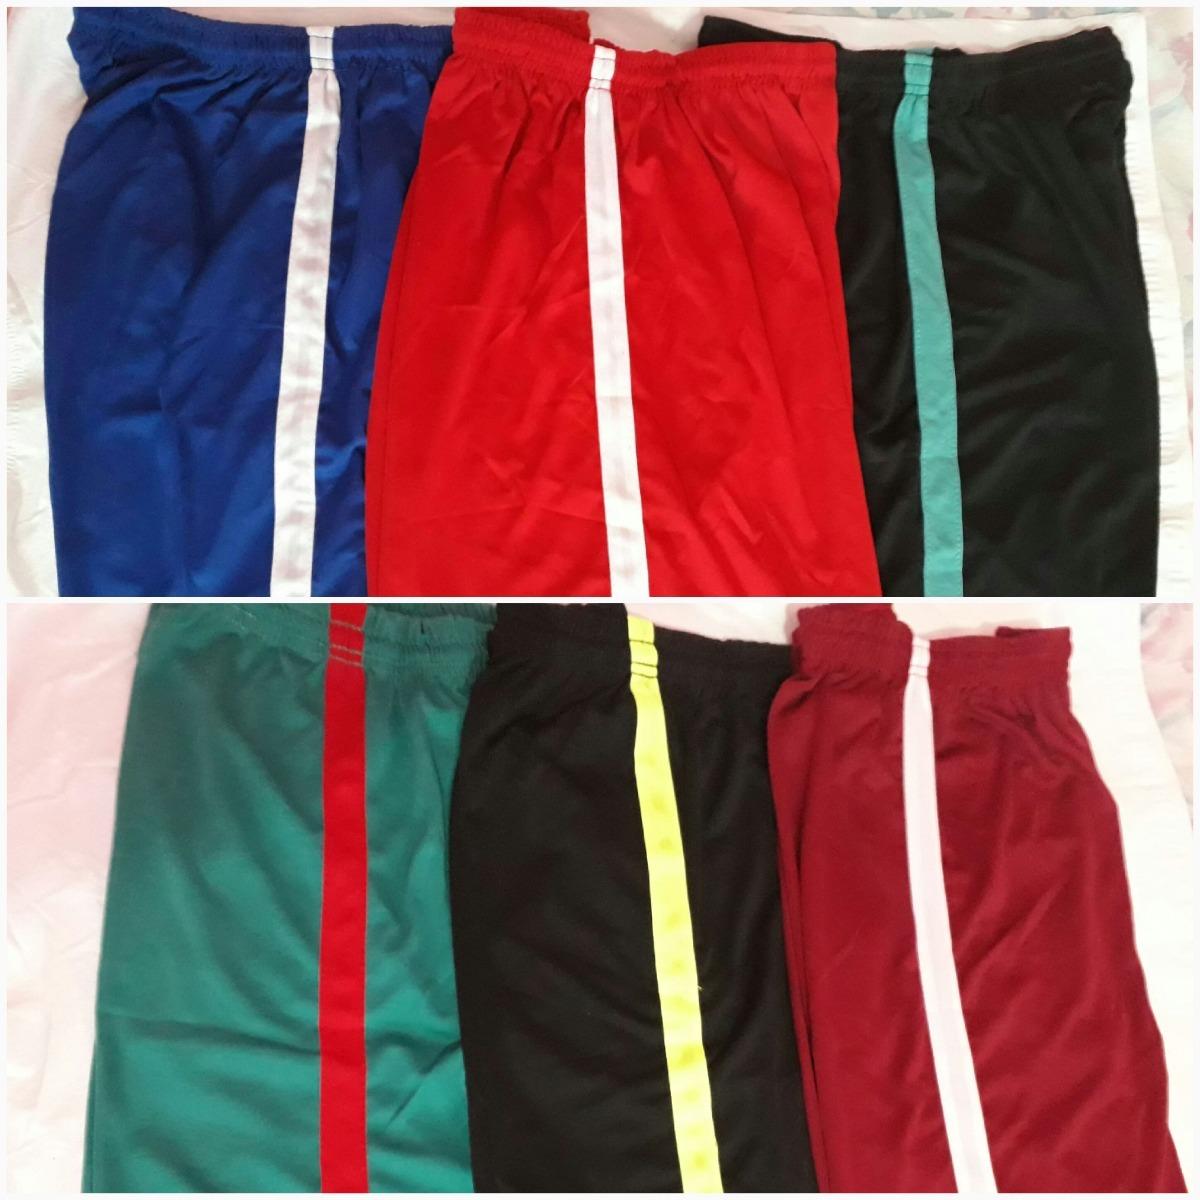 shorts bermuda masculino esportivo corrida kit 20 peças. Carregando zoom. cea4d3a88527b